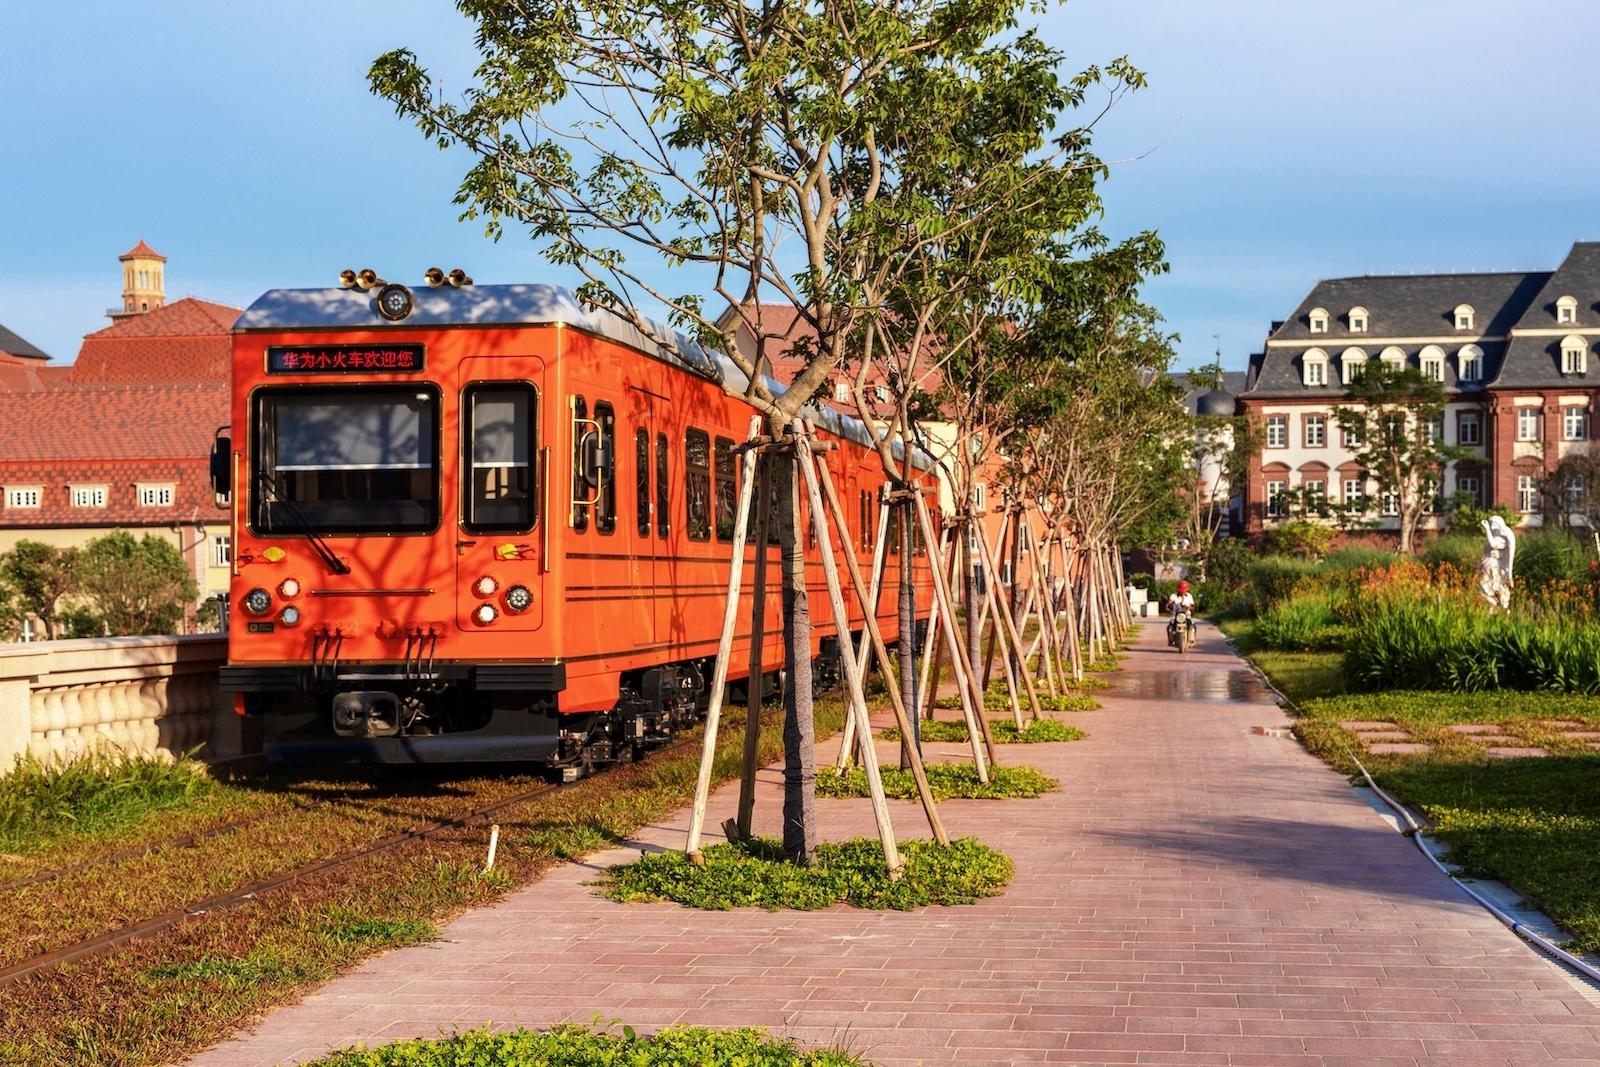 Tramvaj v novém kampusu Huawei